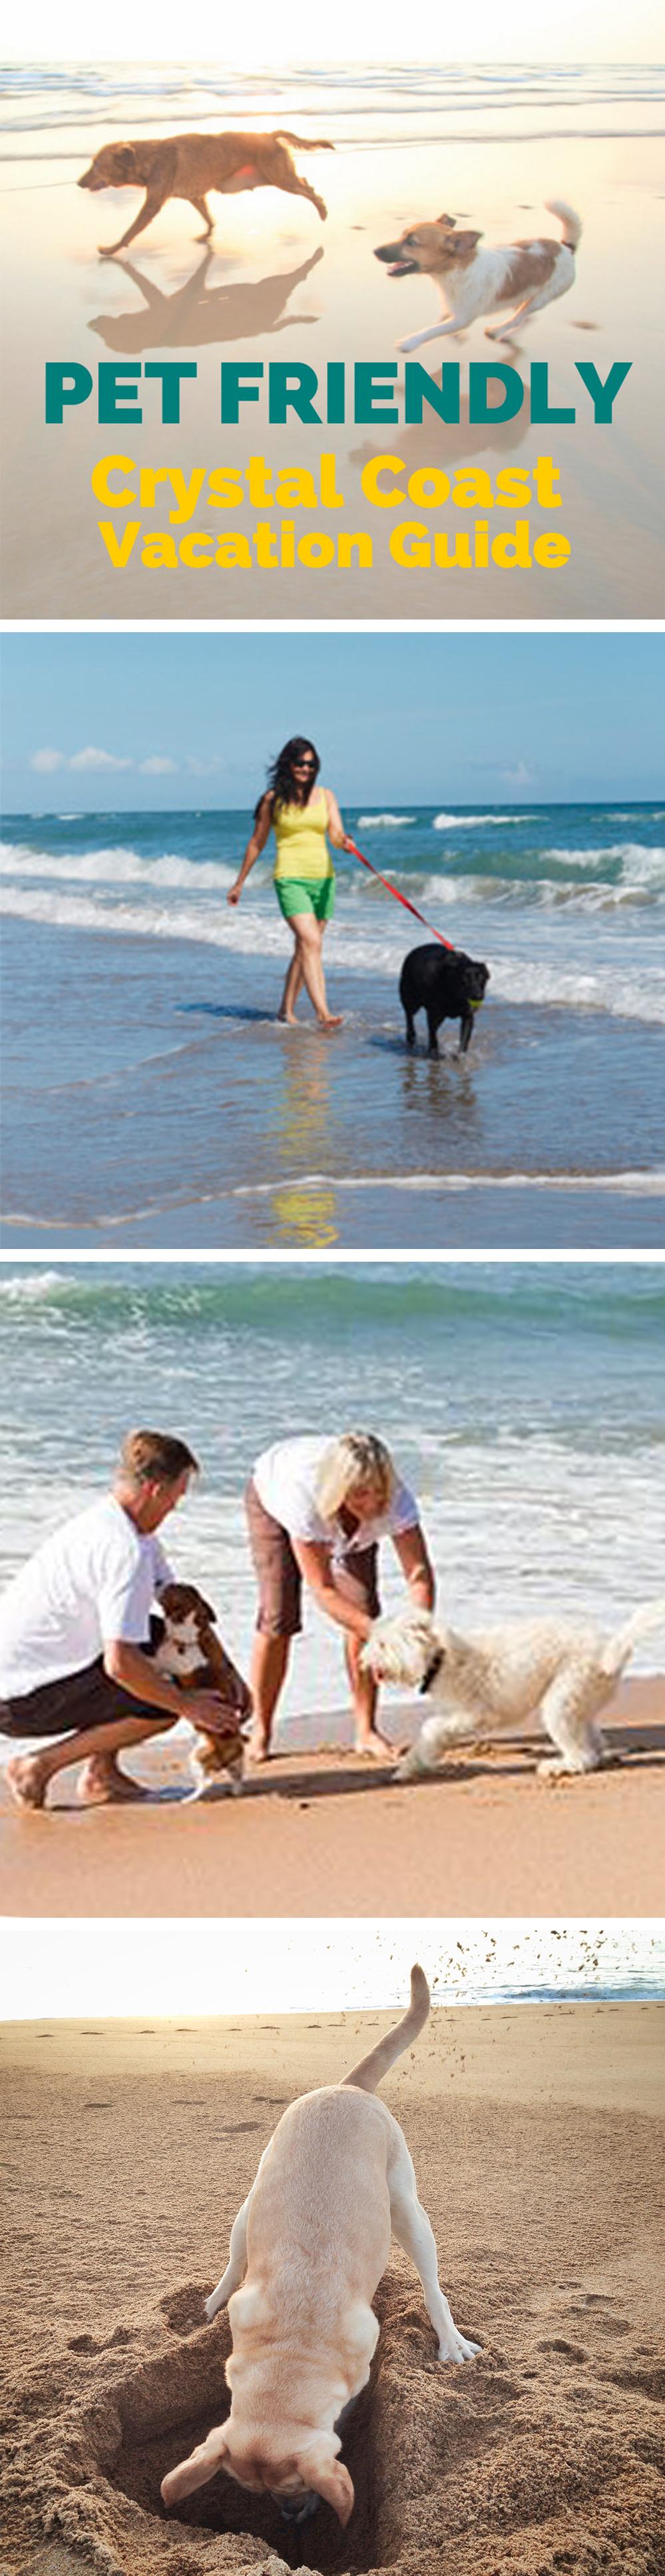 Pet Friendly Beach Rentals Pet Friendly Vacation Rentals Pets Vacation Pictures